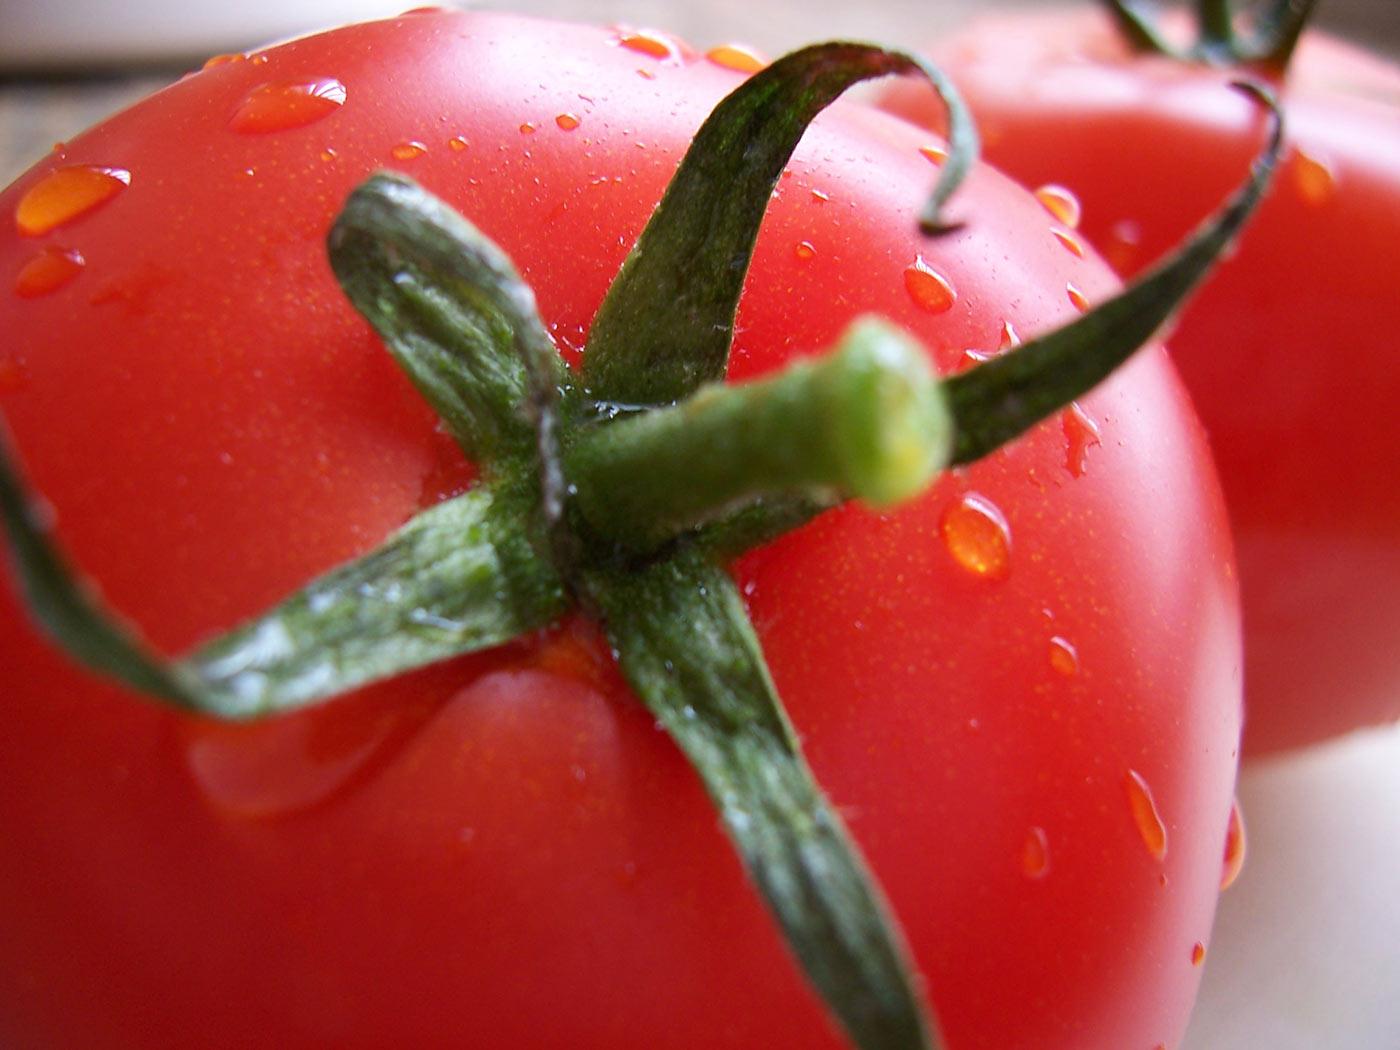 Innovación Tecnológica en Tomate Industrial Cultivar IDIAP T-9